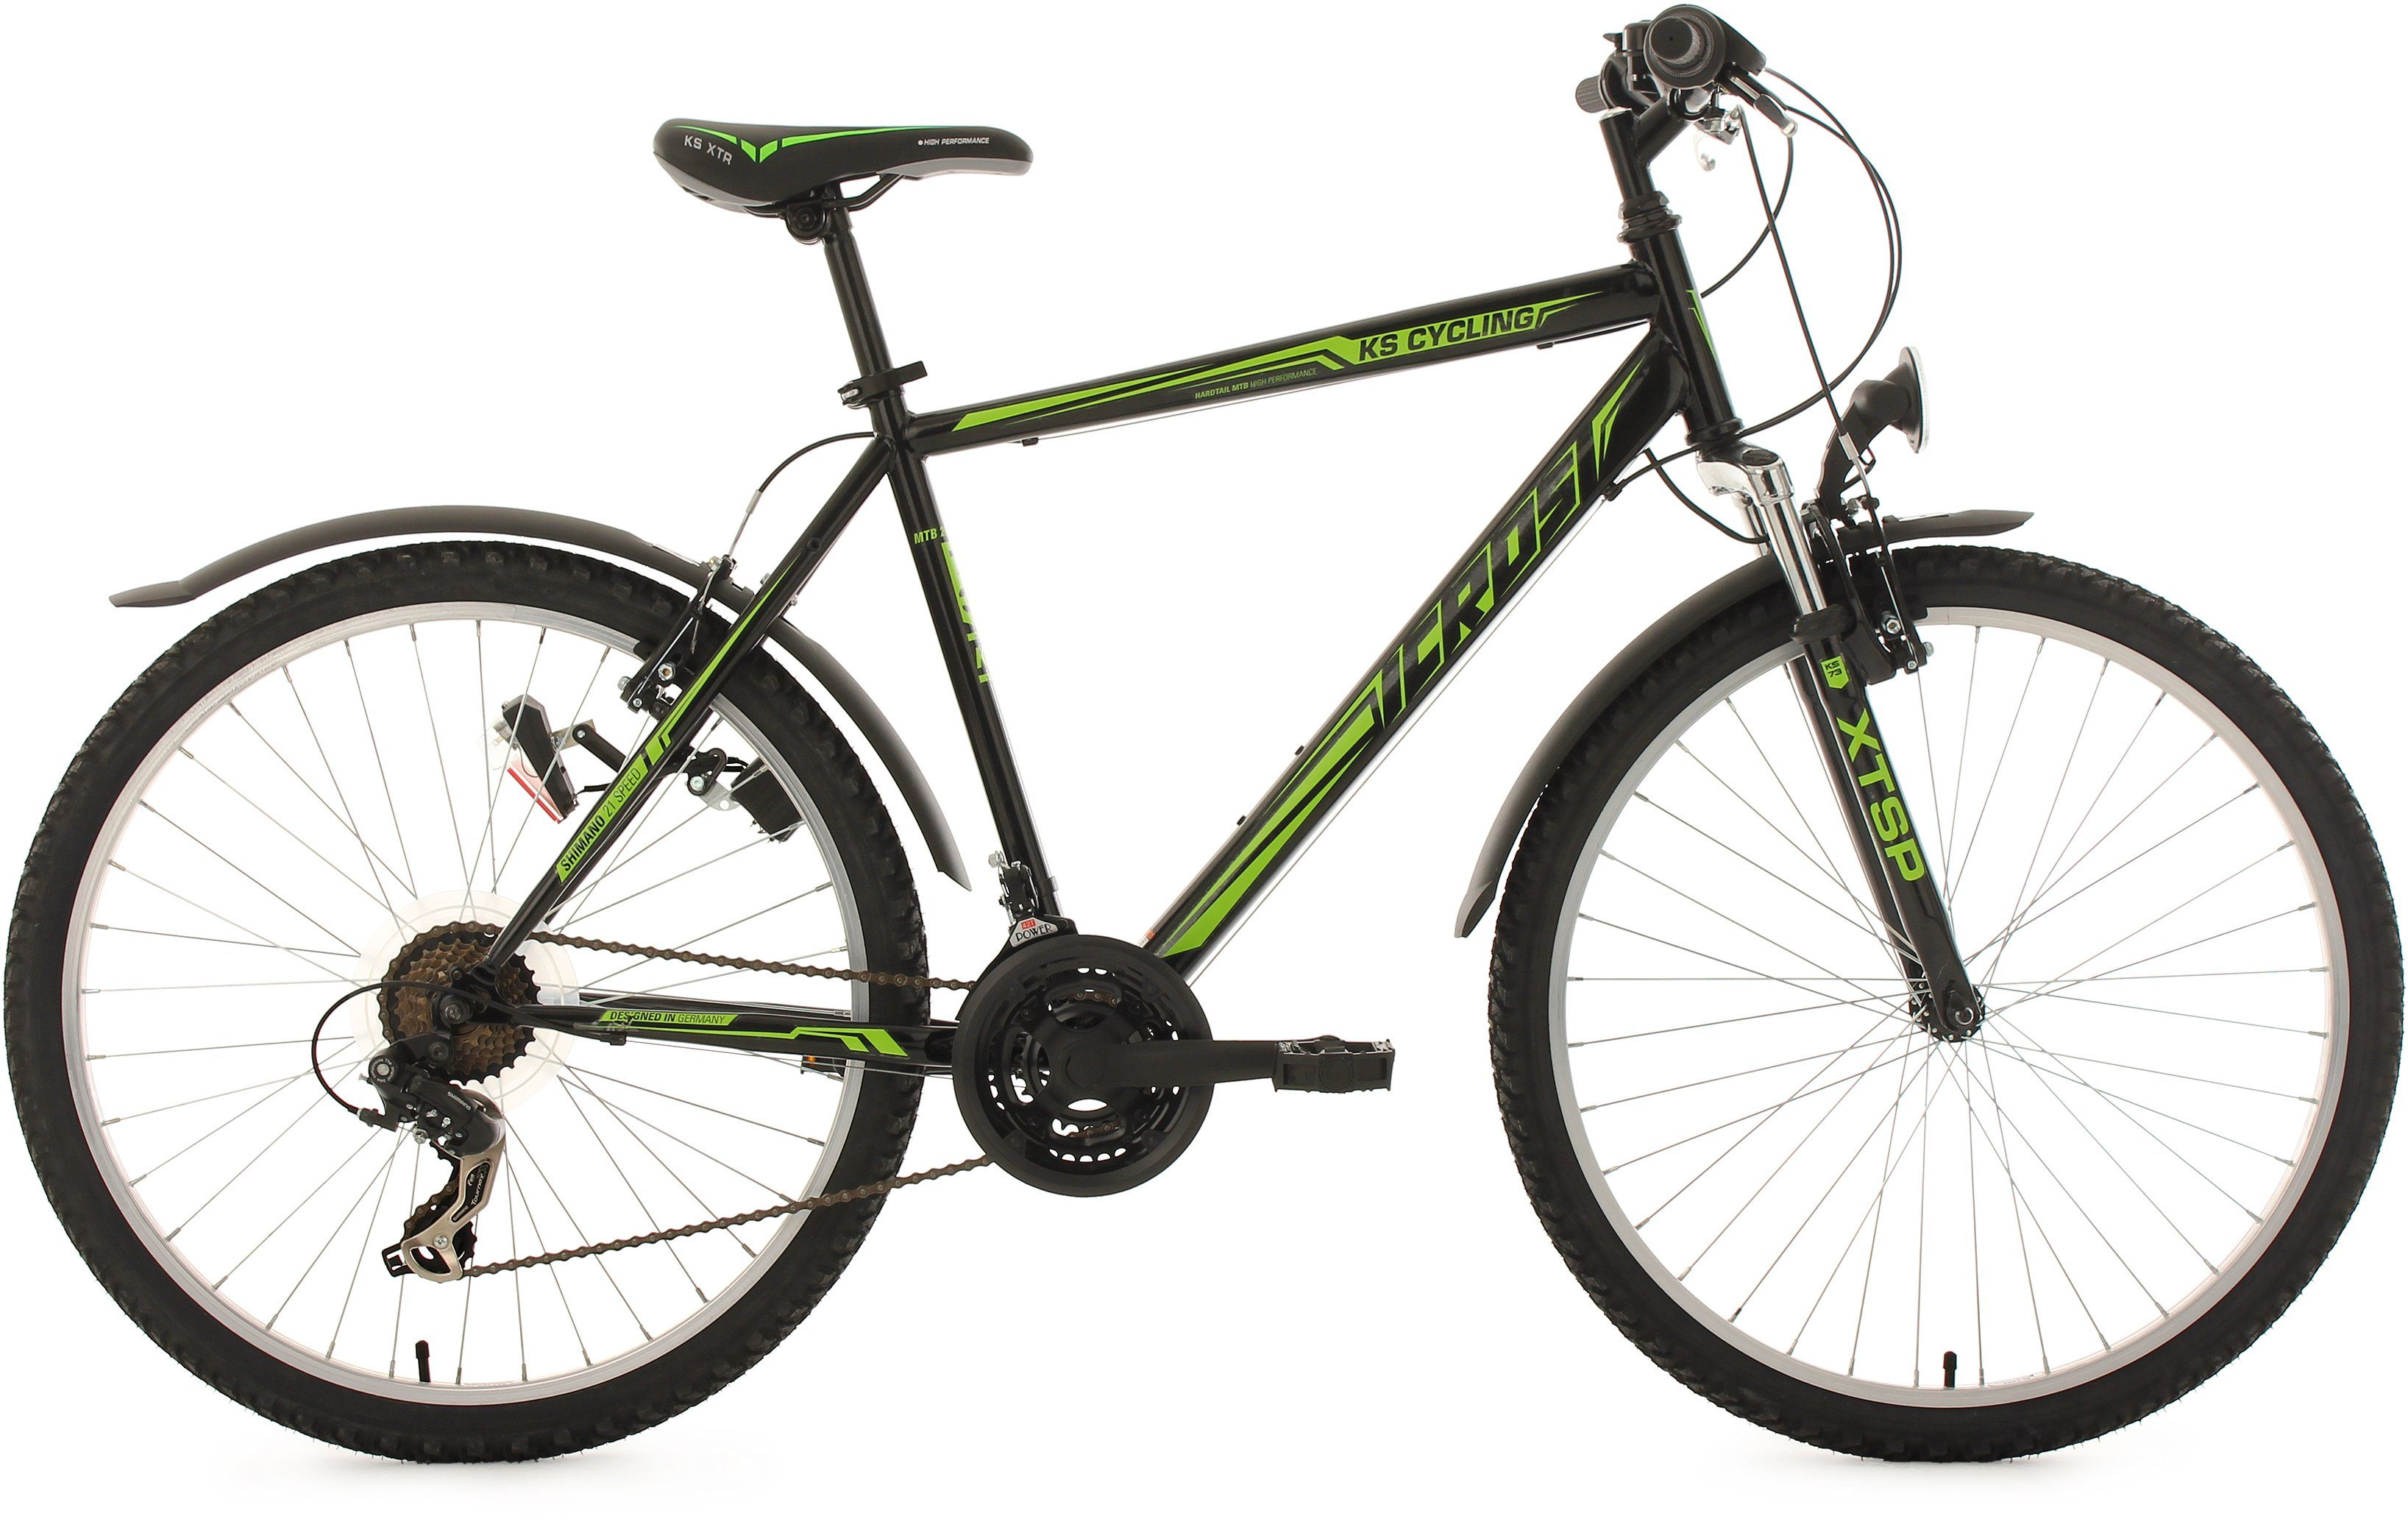 KS Cycling Herren Hardtail-MTB, 26 Zoll, 21 Gang-Shimano Tourney Kettensch, schwarz-grün, »Icros«